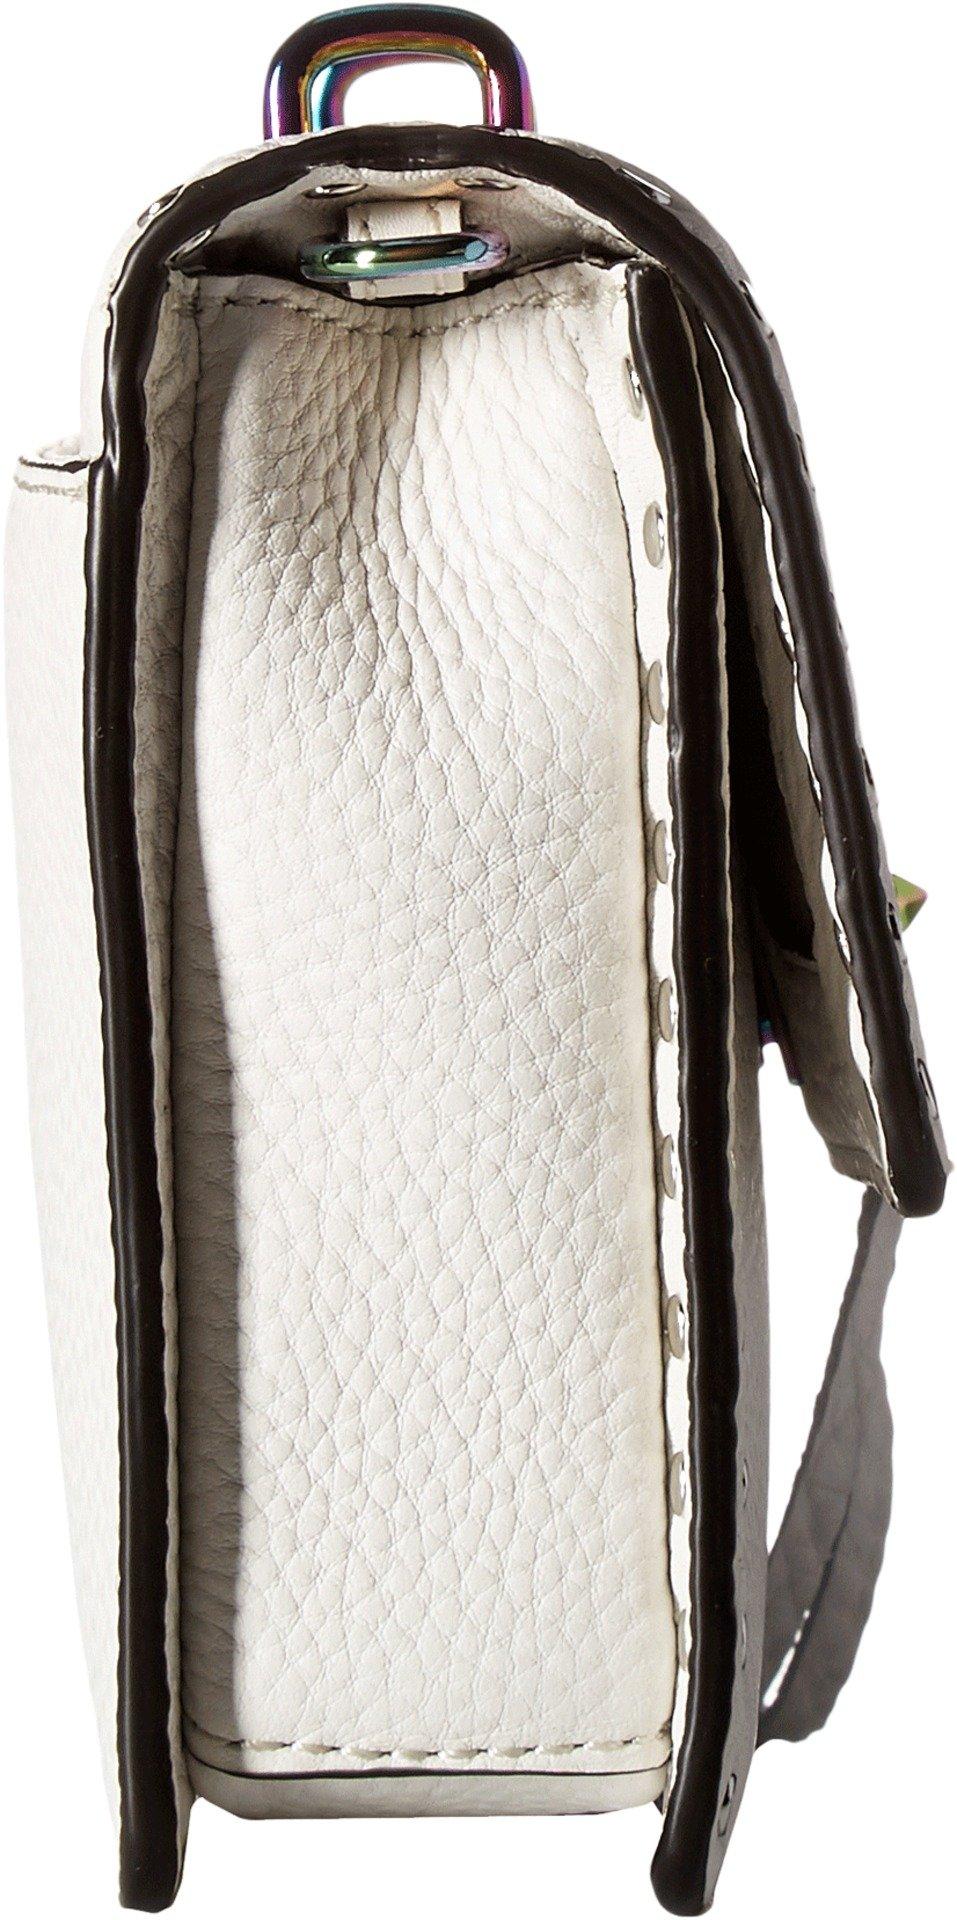 Rebecca Minkoff Women's Darren Top-Handle Flap Crossbody Bianco One Size by Rebecca Minkoff (Image #3)